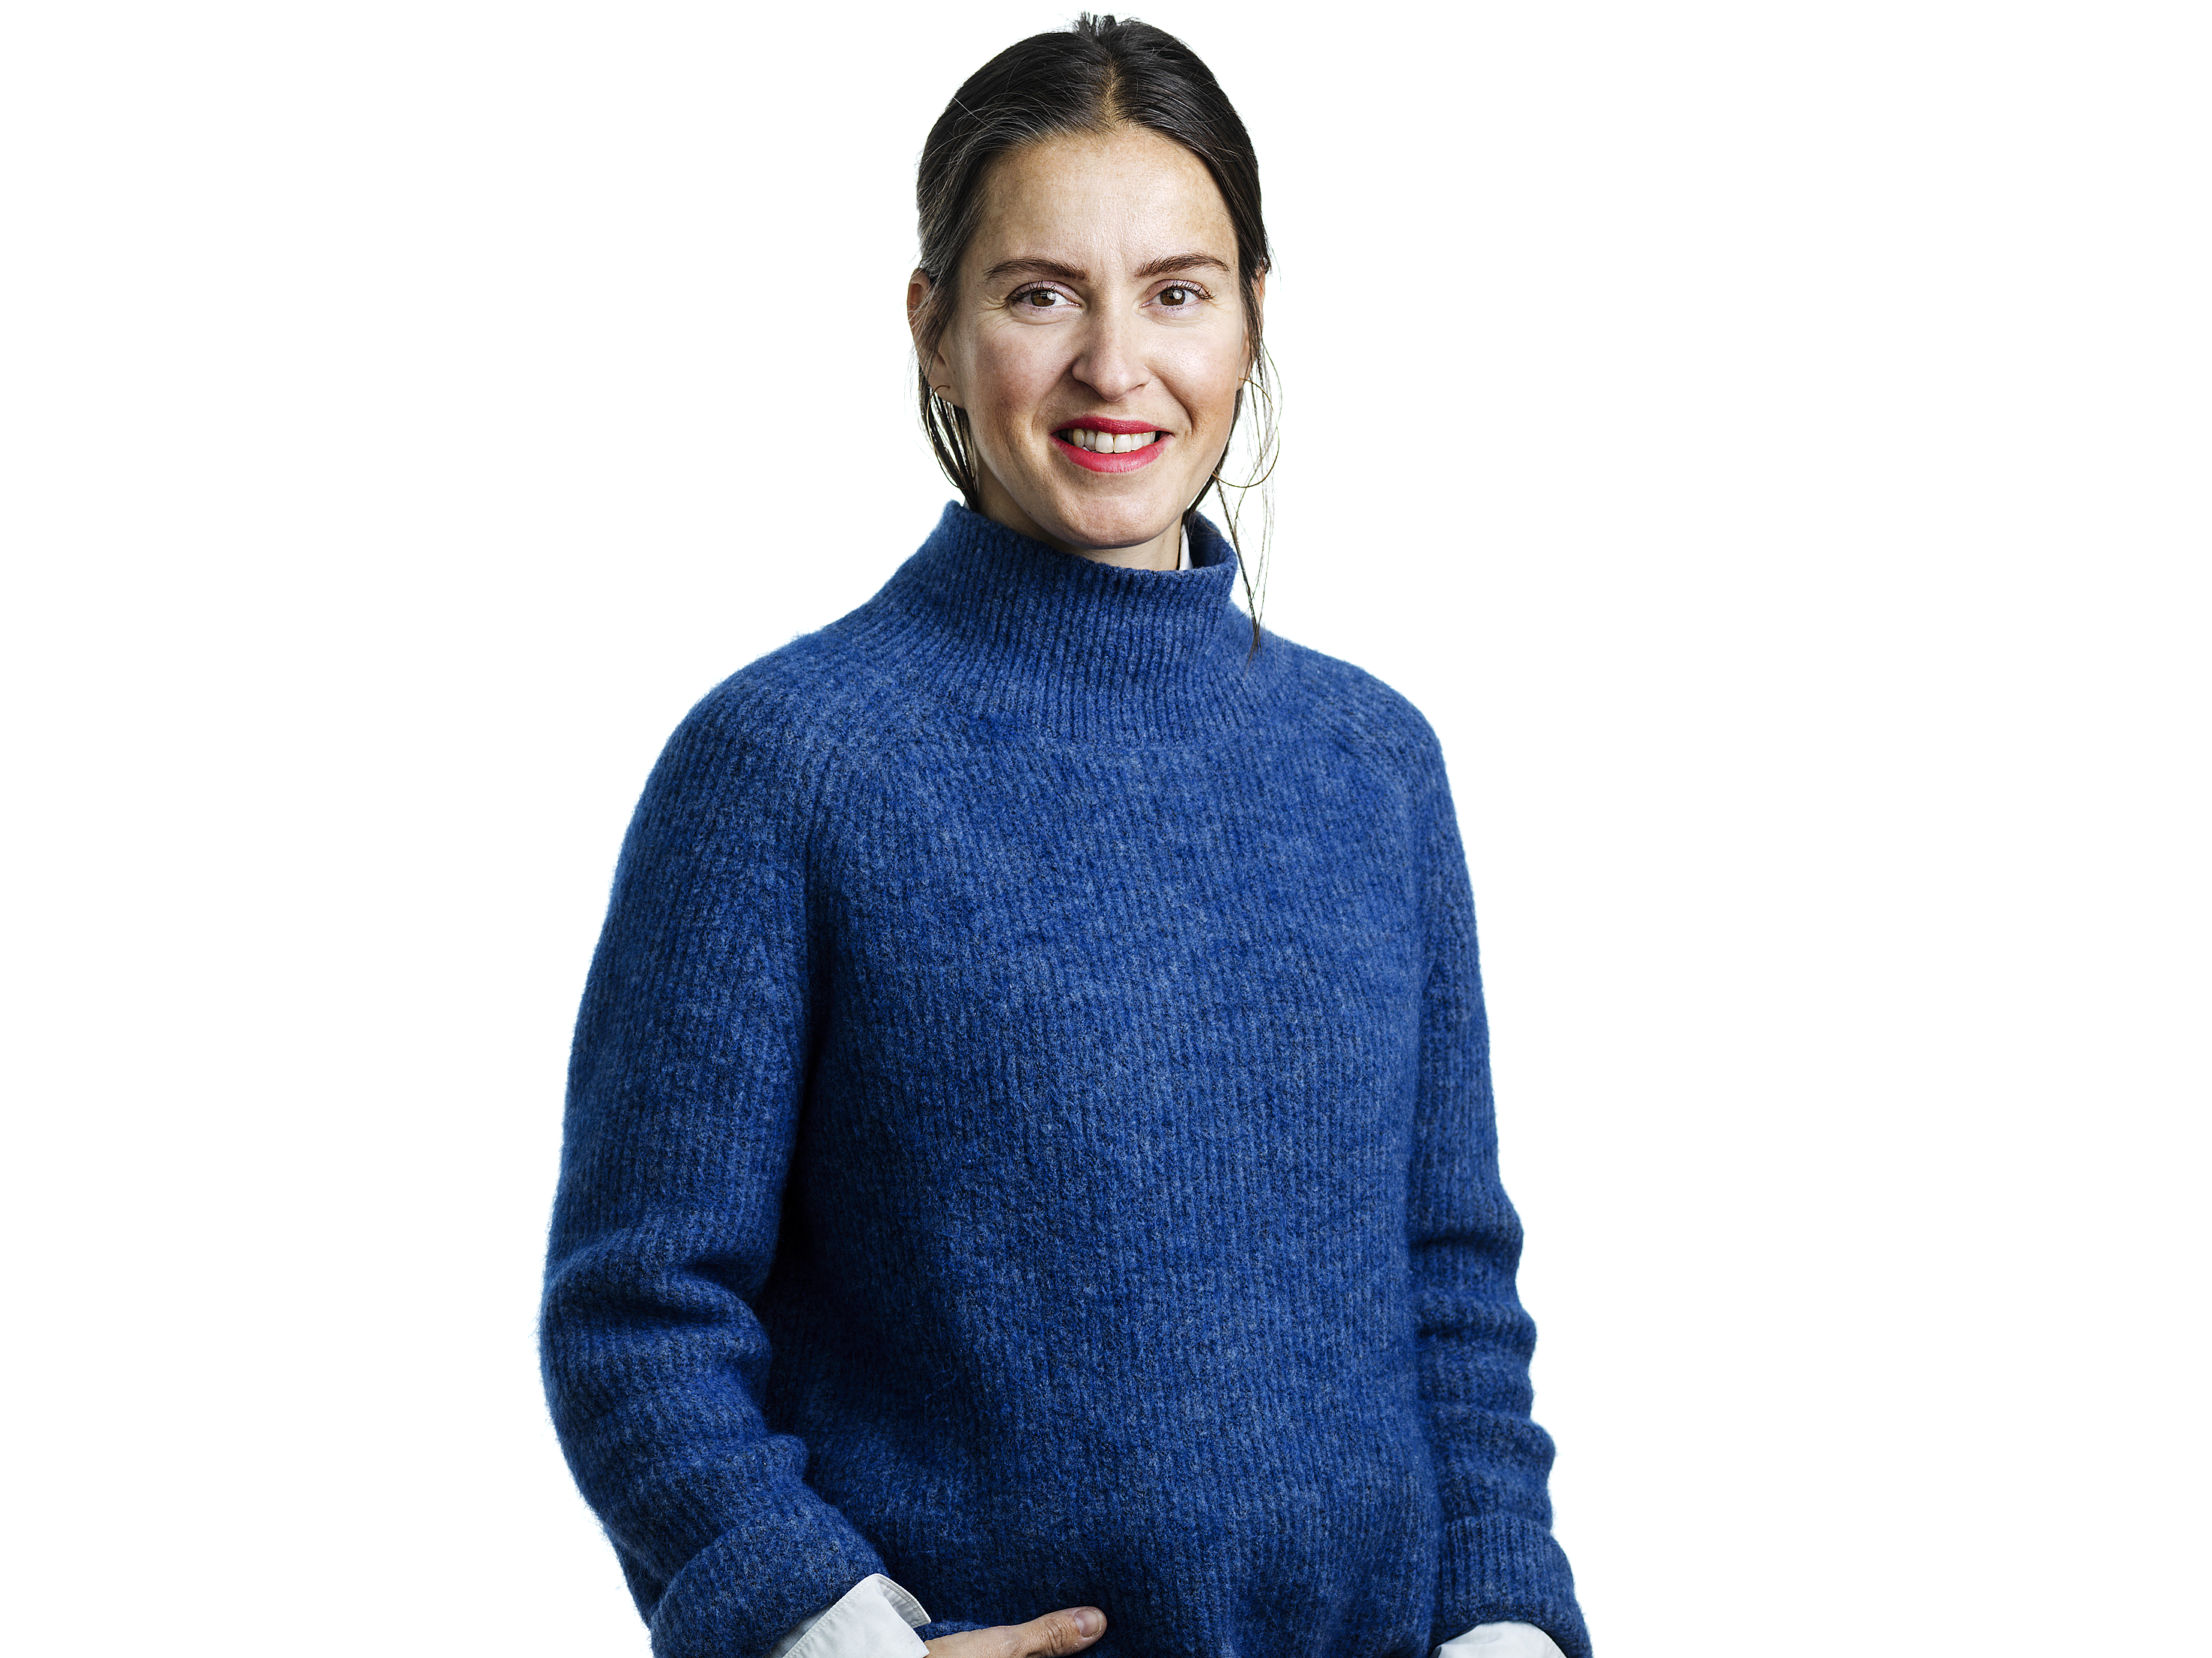 Anna Haraldsson Jensen